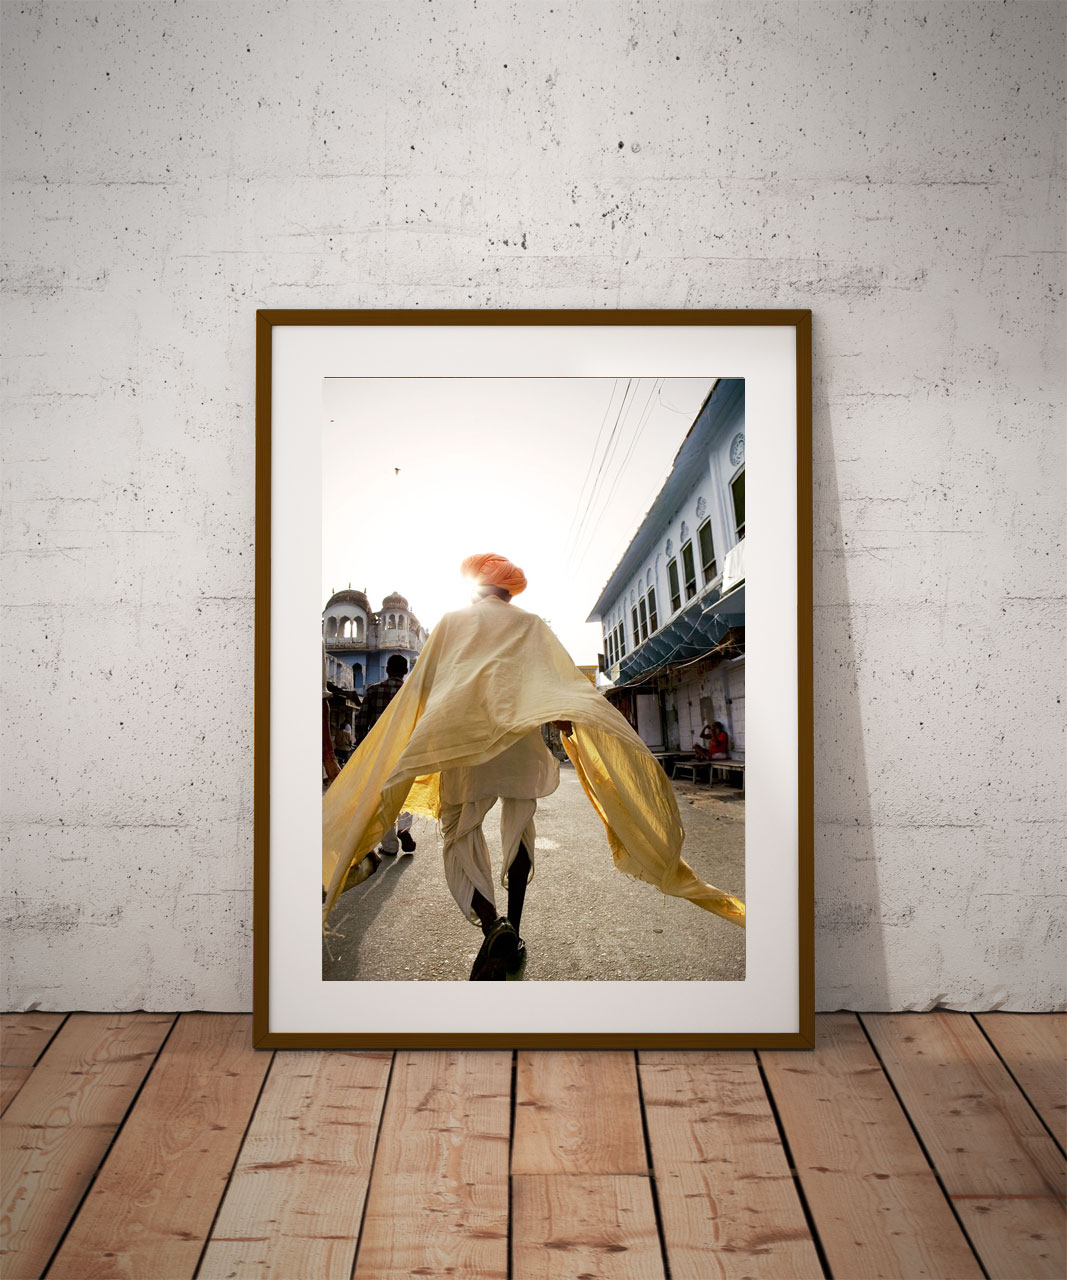 'Pushkar Man Walking' © Jason Florio - color - Indian man walks down an urban street, saffron robes flowing